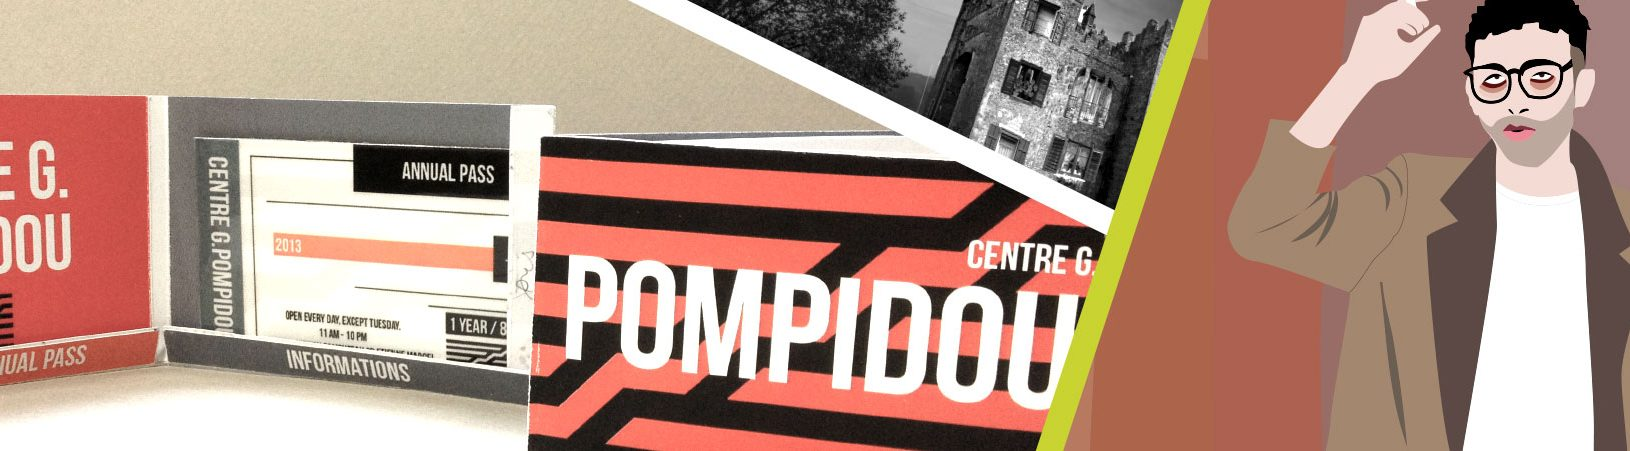 formation multimédia print - comart-design